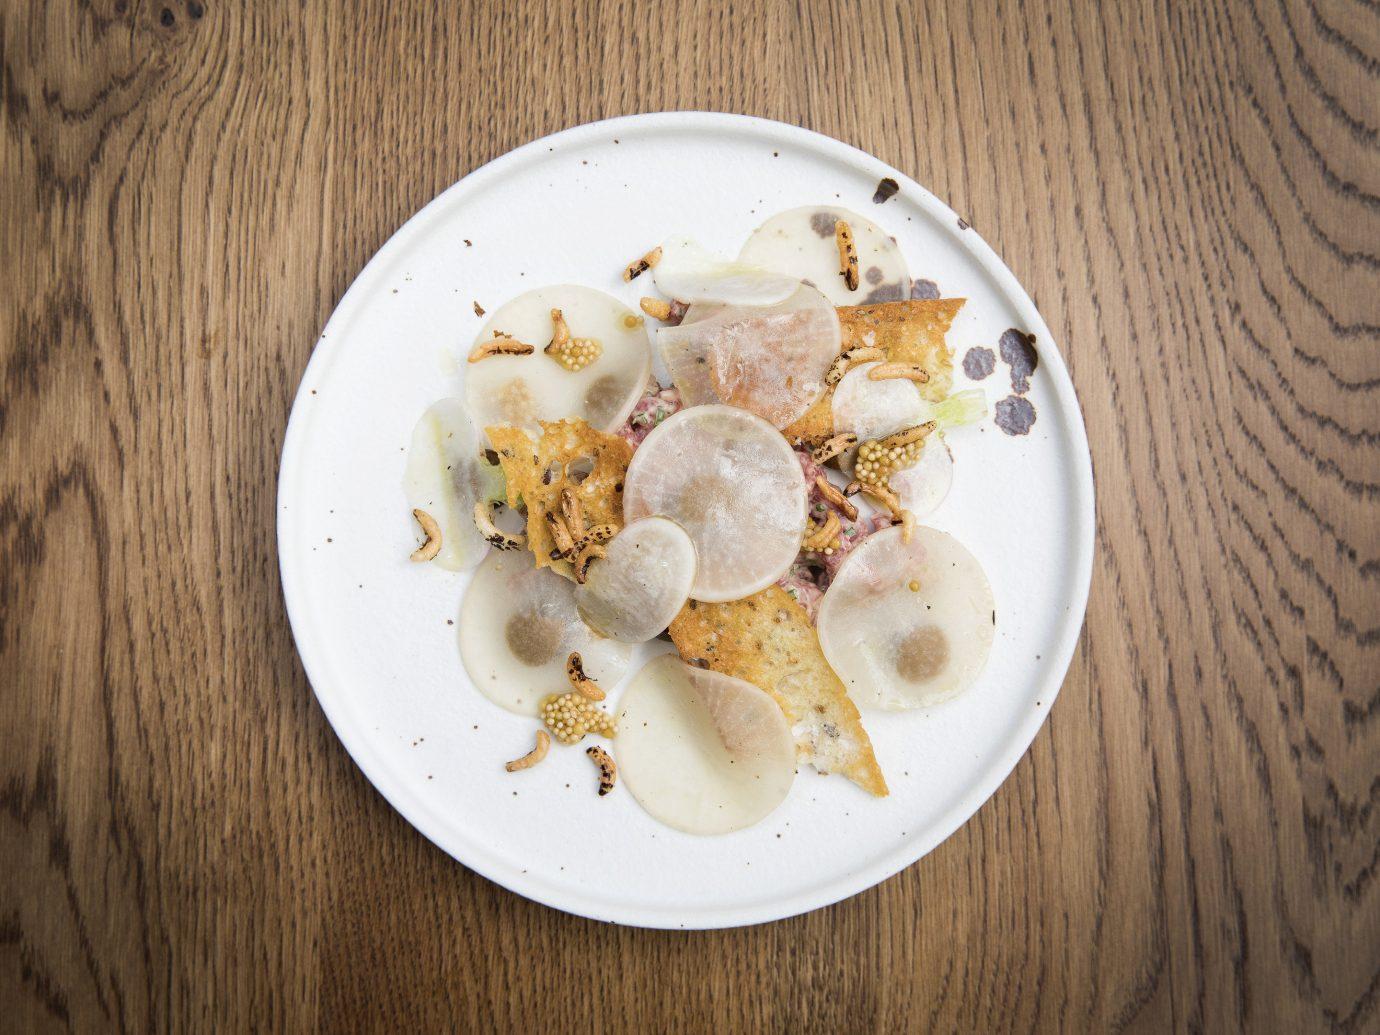 England europe London Luxury Travel Trip Ideas plate food table dish wooden breakfast dishware slice meal fork eaten recipe half dessert sliced